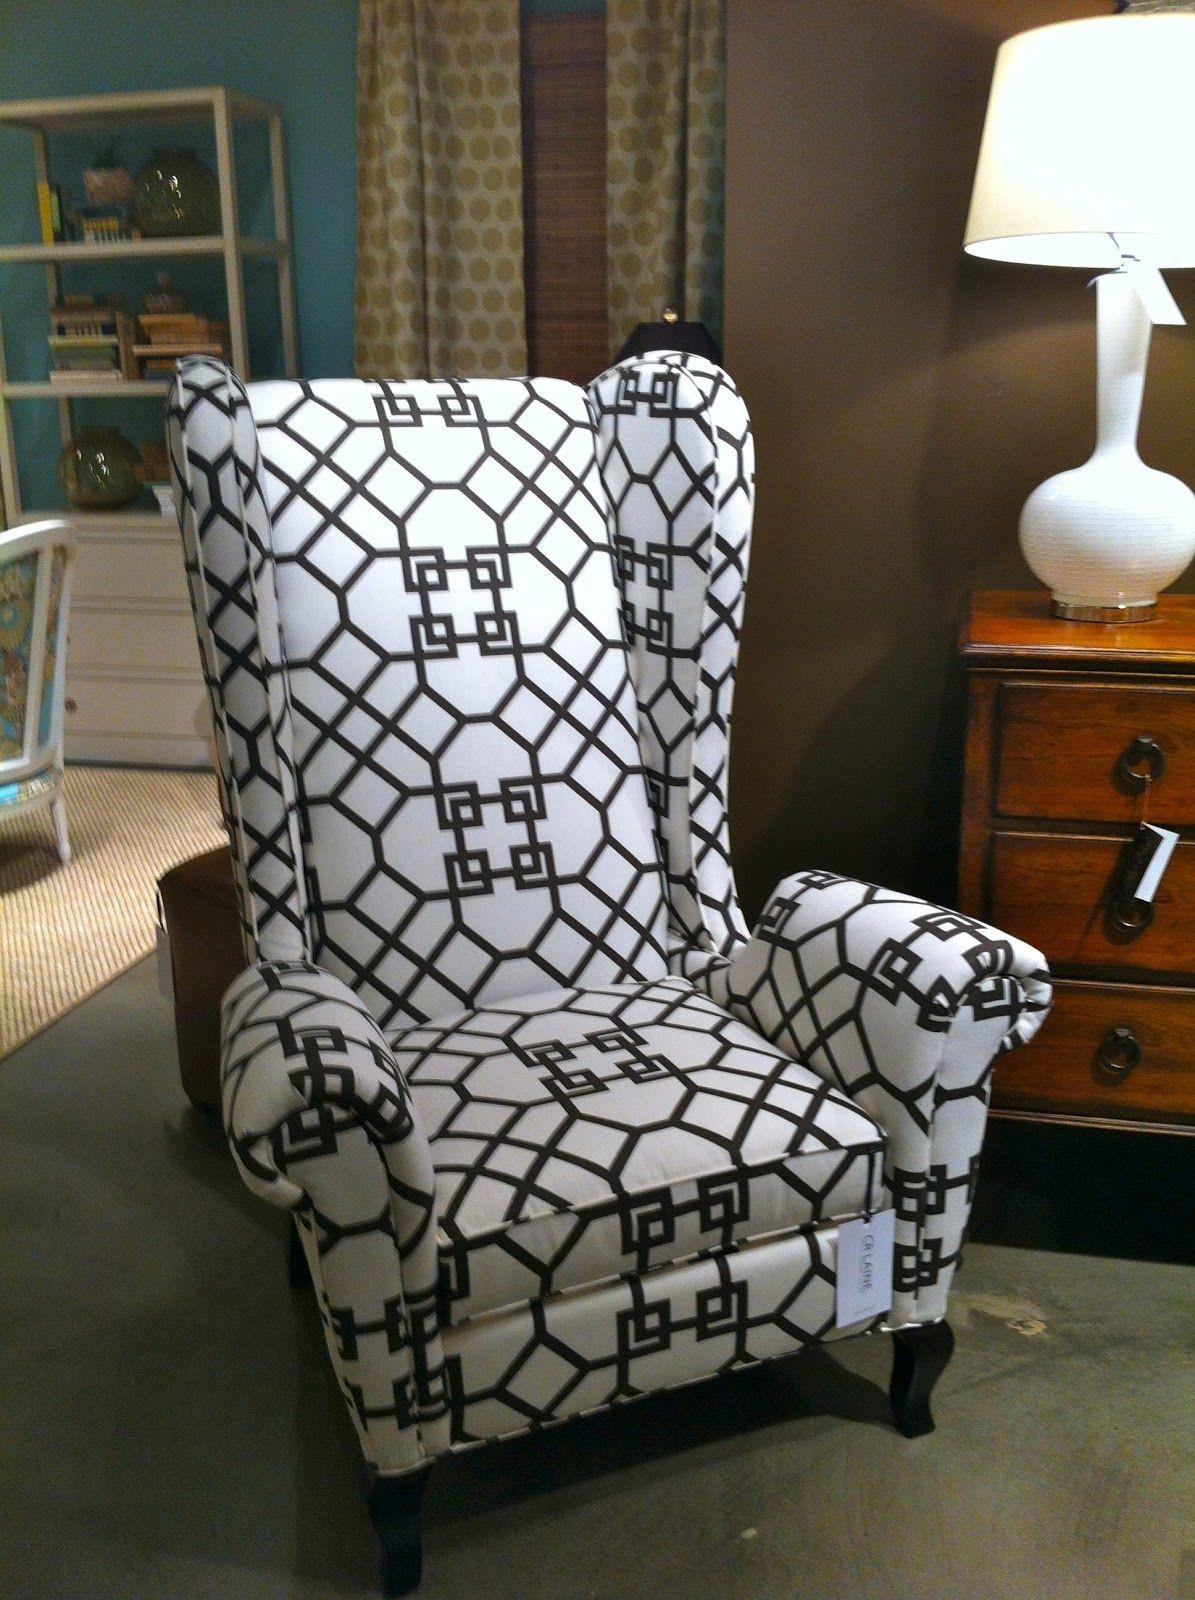 CR Laine in Windsor Smith fabric on Lisa Mende Design